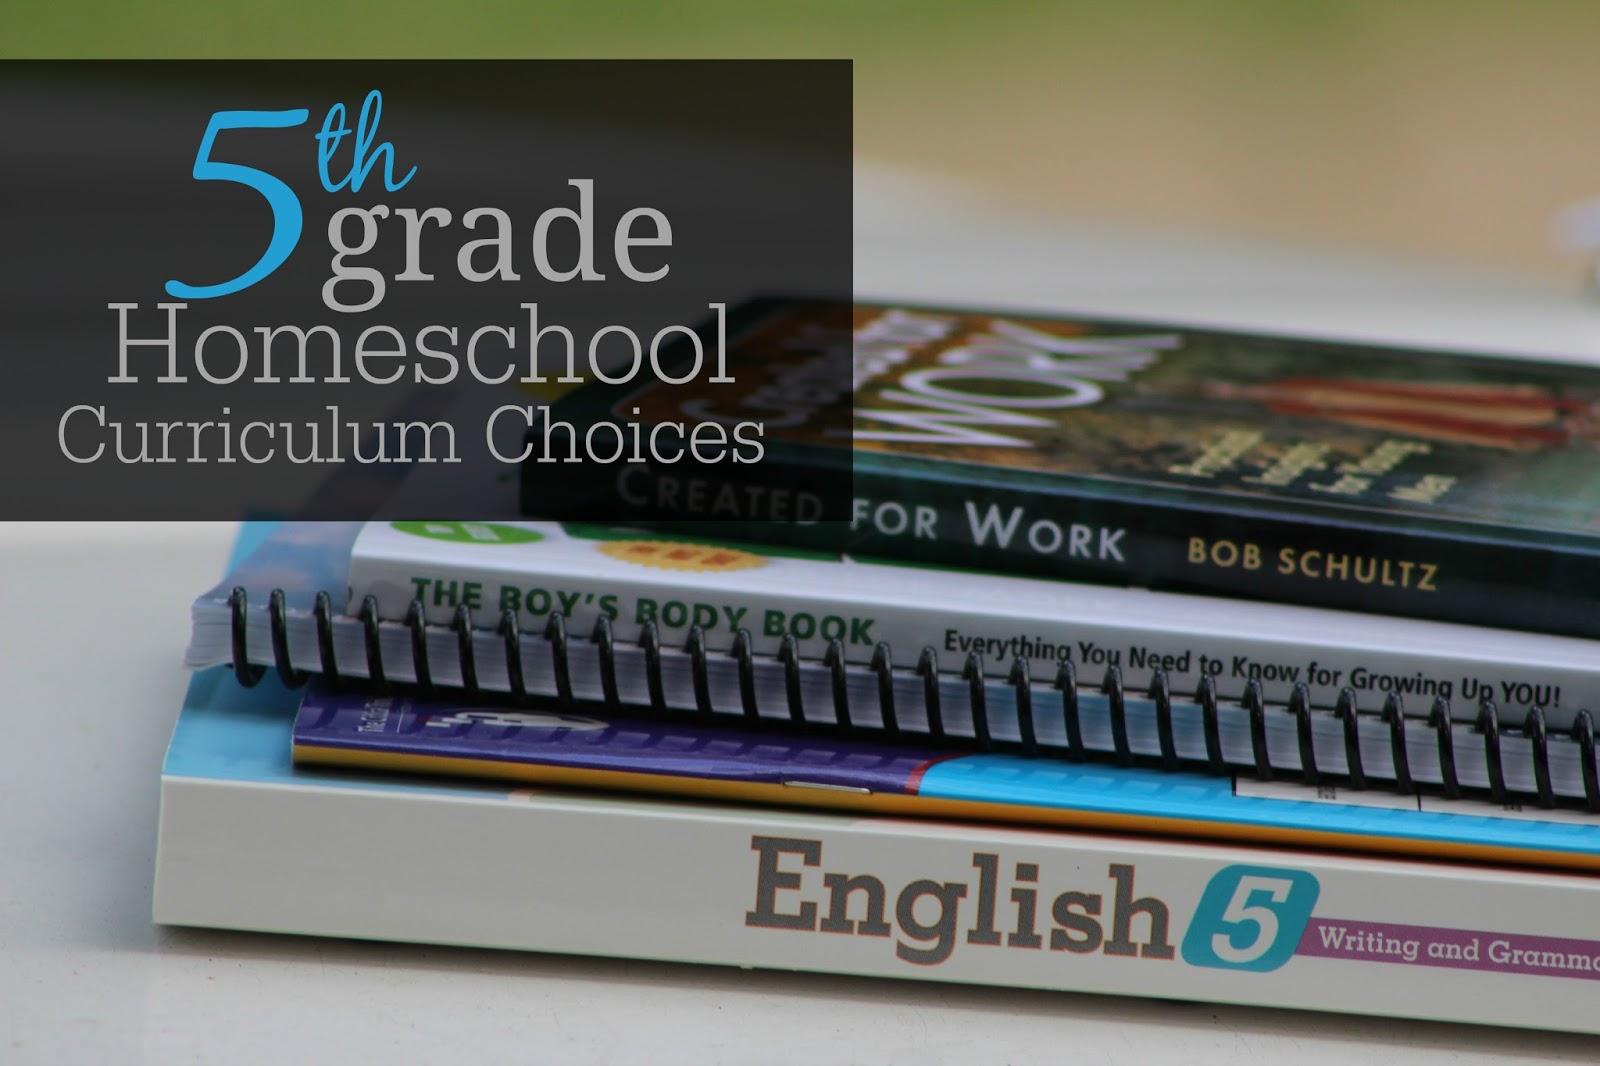 was on your homeschool curriculum list last year?